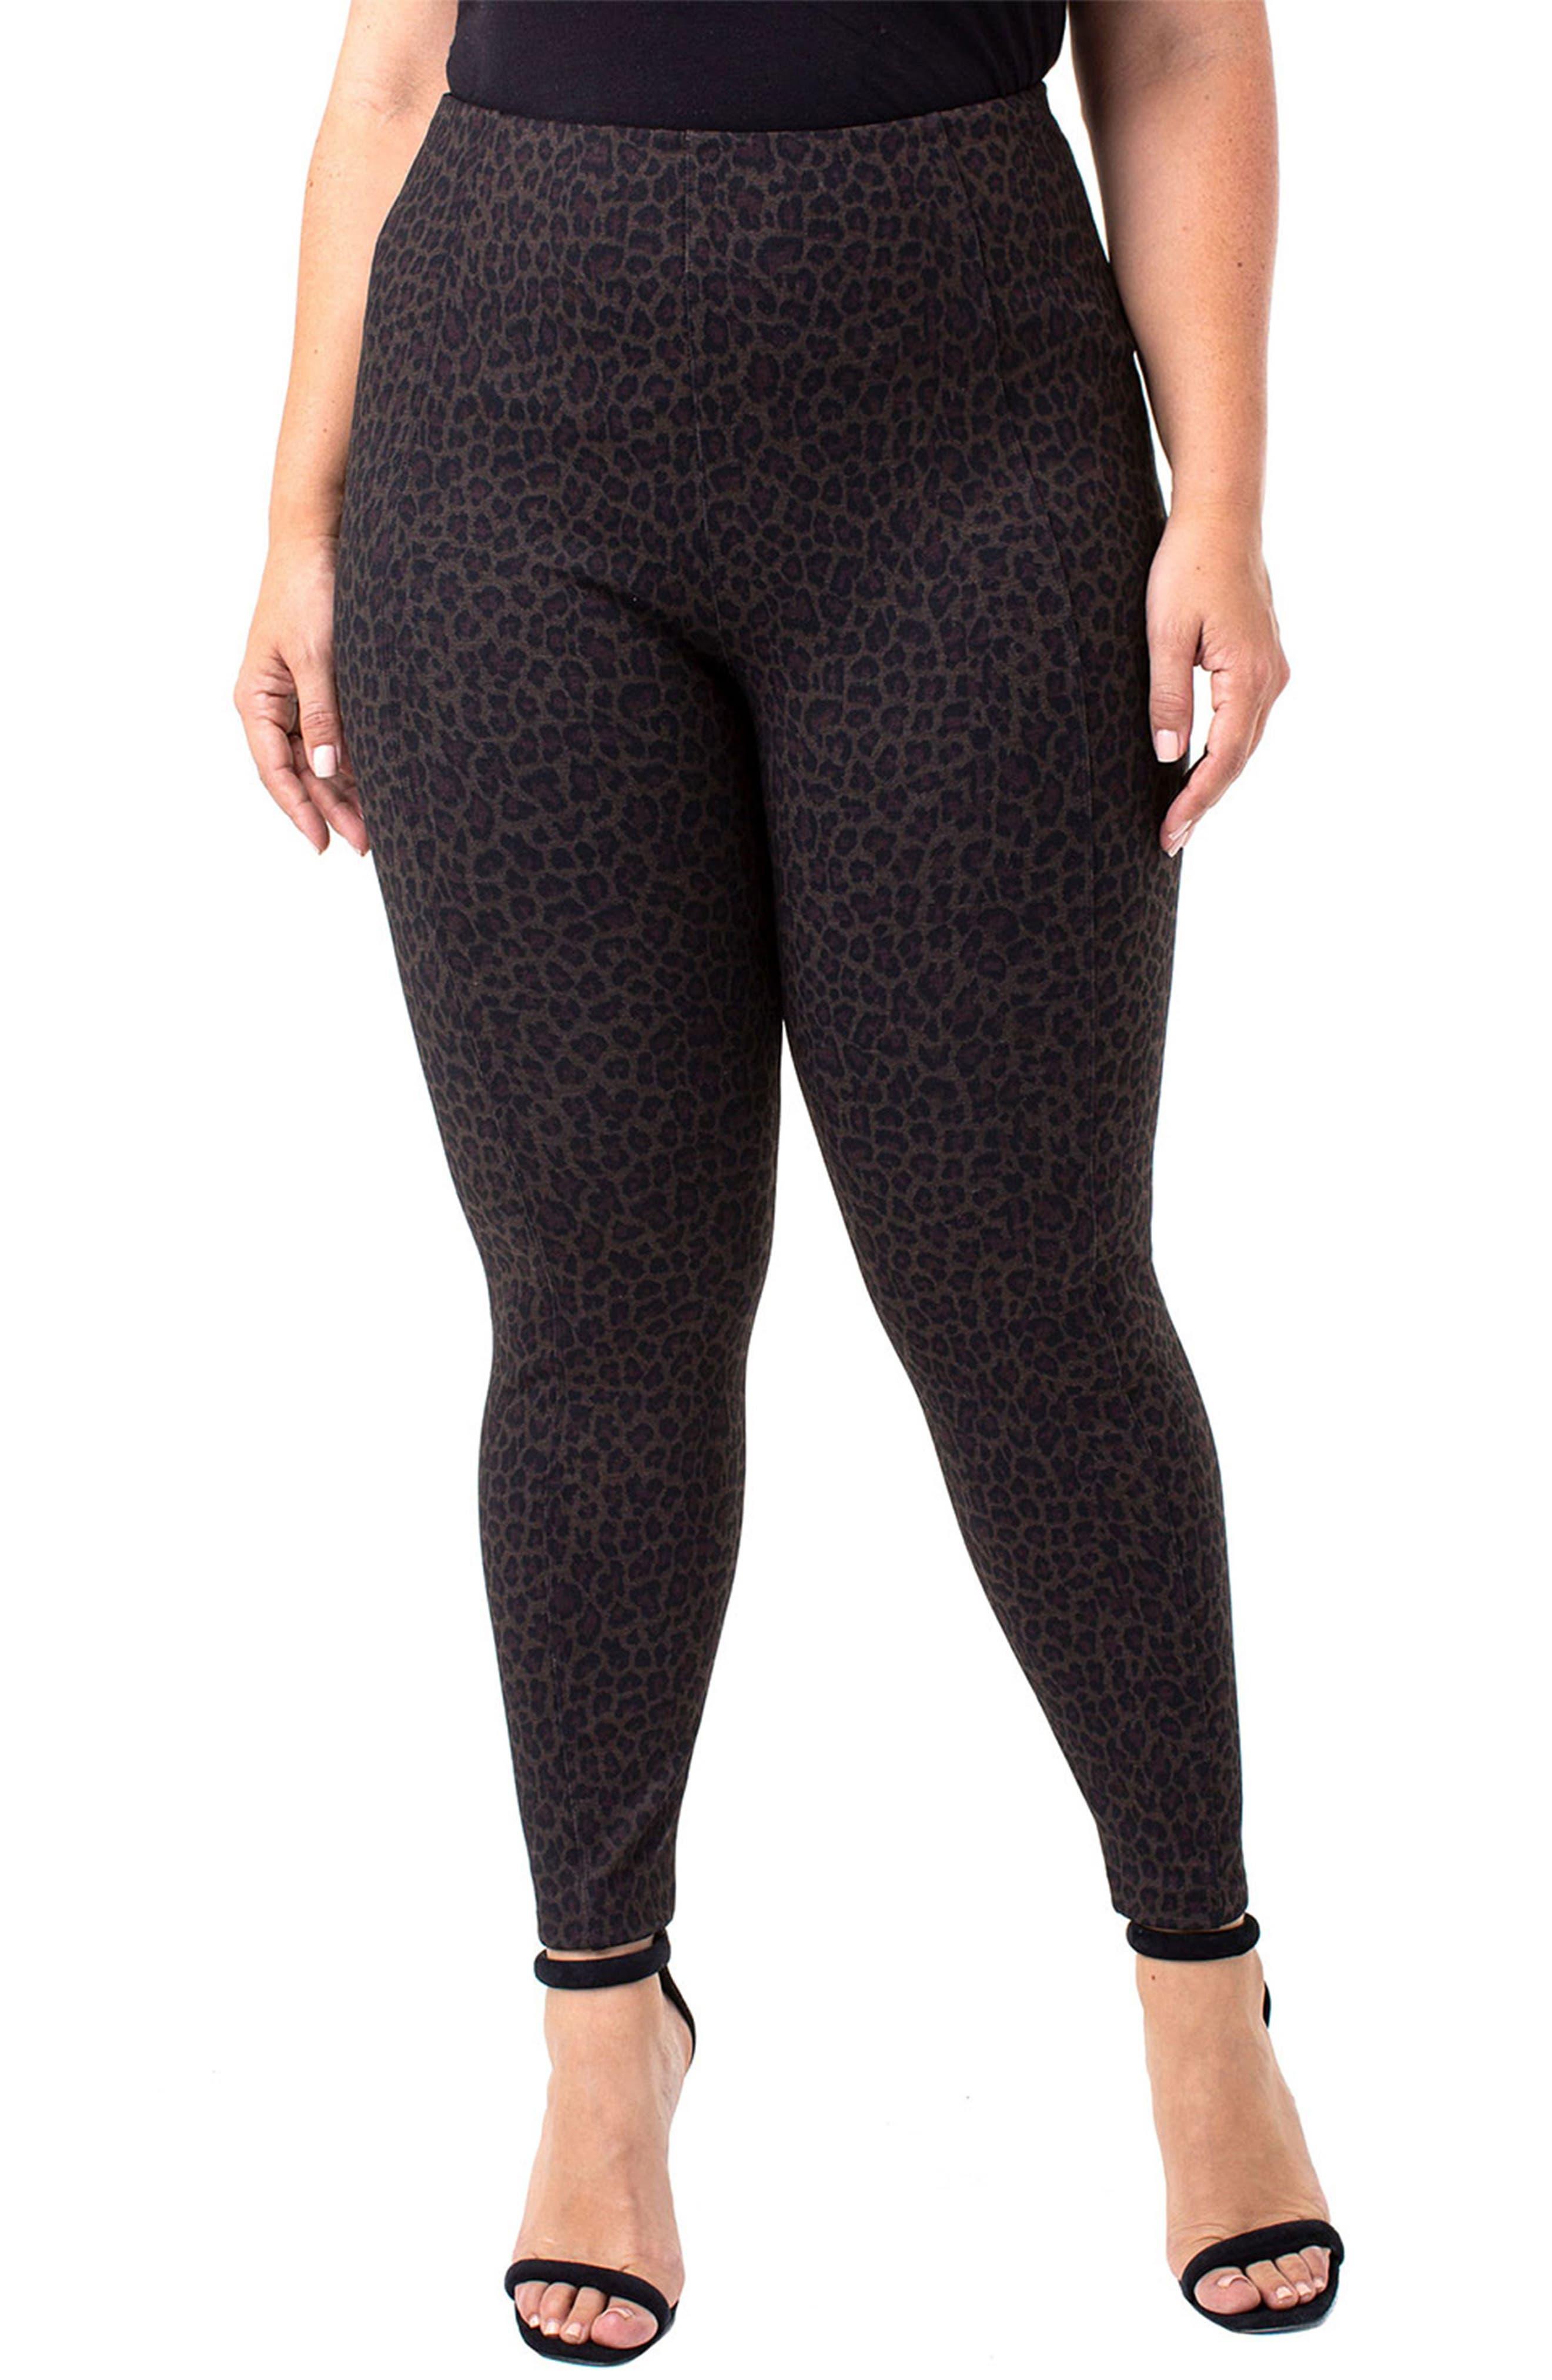 Image of Liverpool Jeans Co Reese High Waist Cheetah Print Leggings